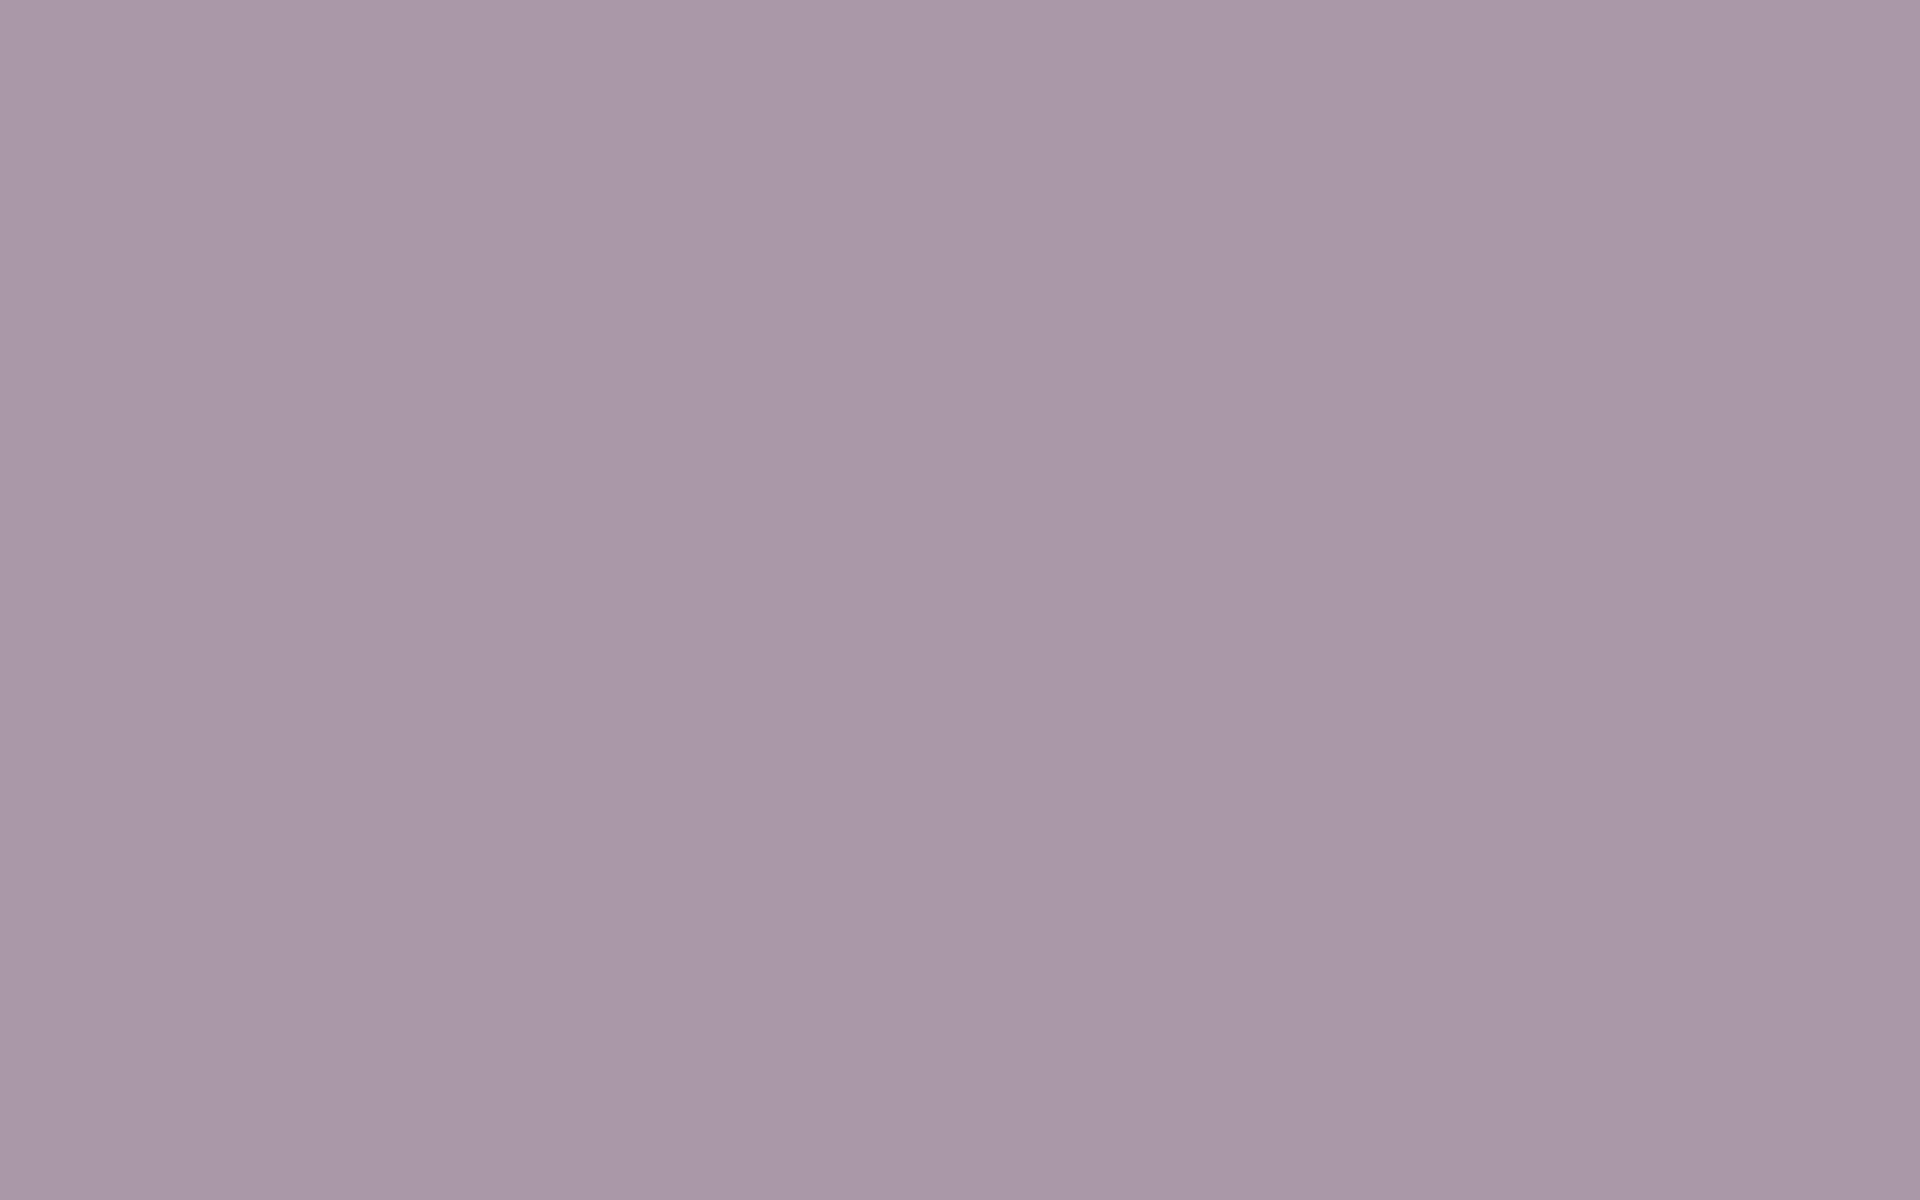 1920x1200 Rose Quartz Solid Color Background